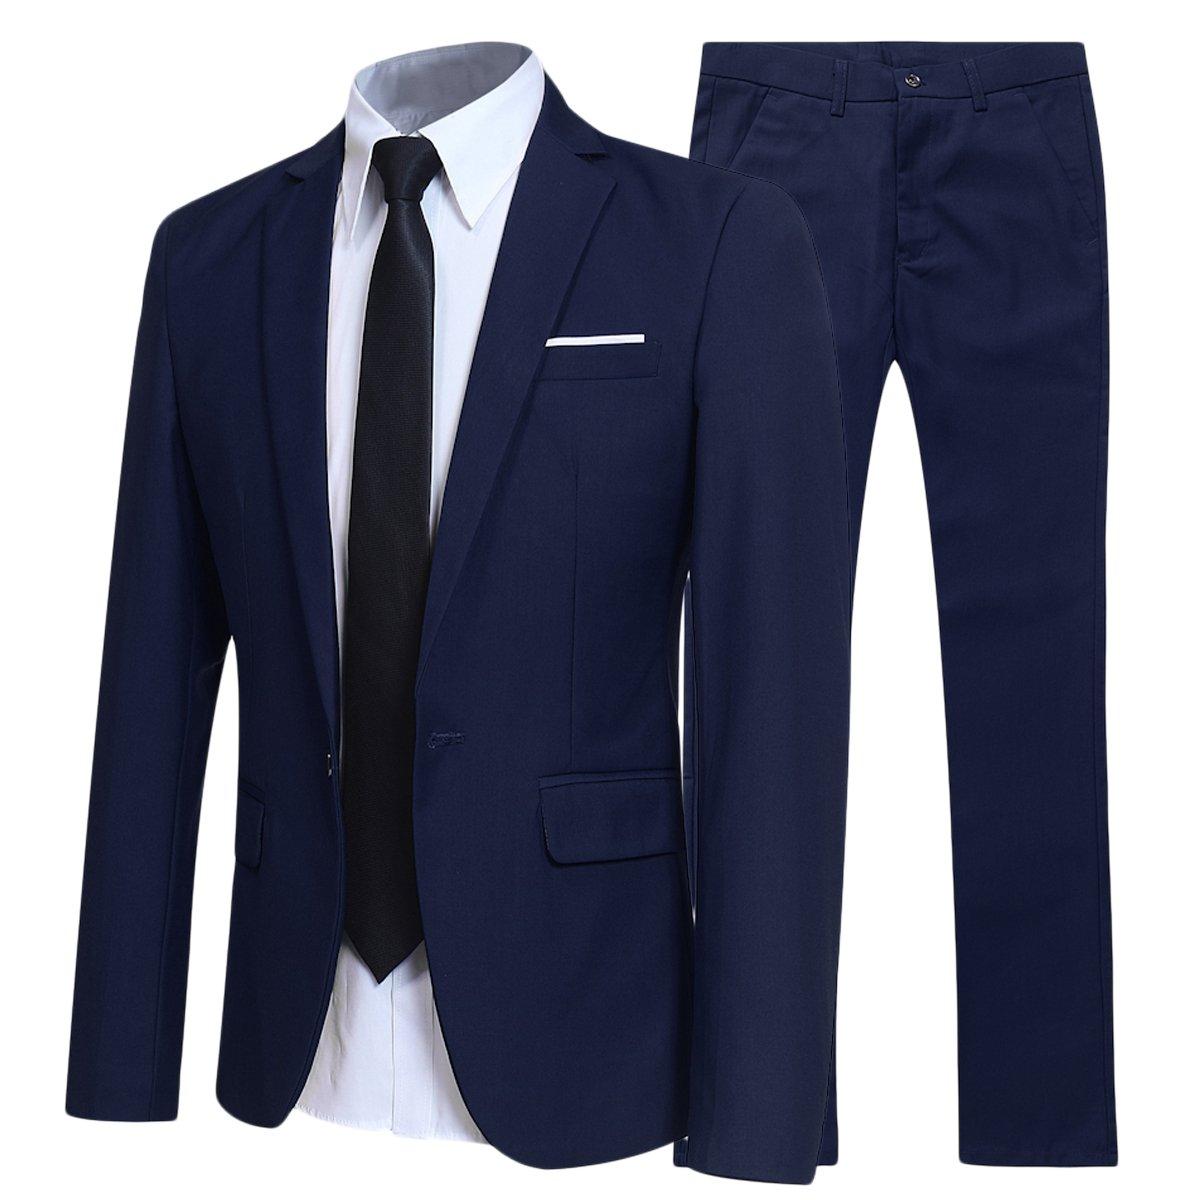 YFFUSHI Slim Fit 2 Piece Suit For Men One Button Casual/Formal/Wedding Tuxedo,Navy,Medium